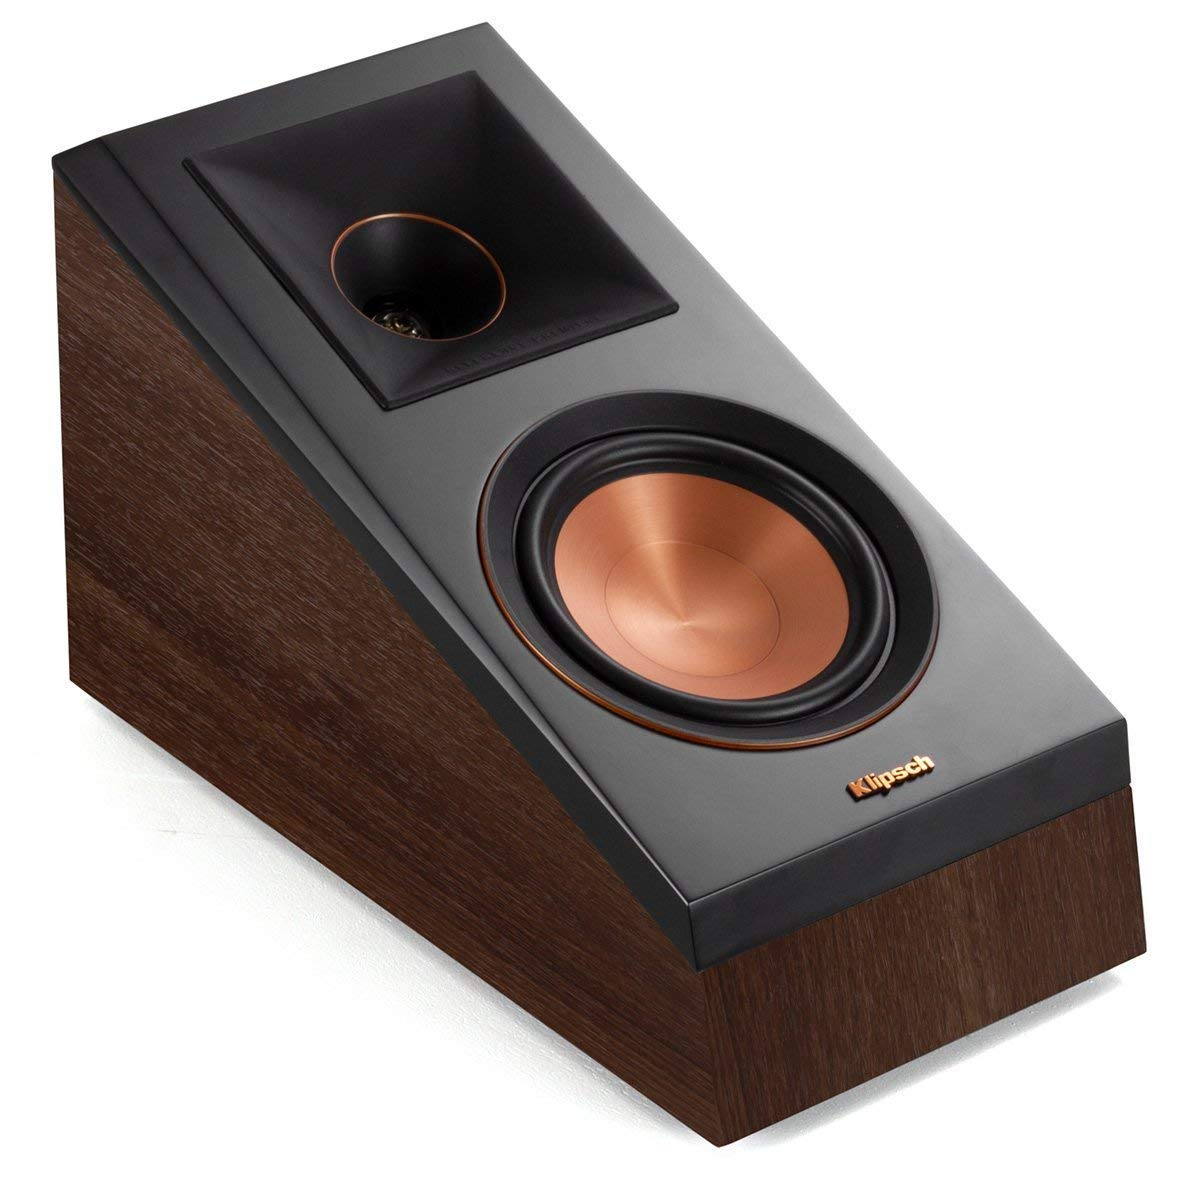 Klipsch RP-500SA Dolby Atmos Surround Sound Speakers (Walnut)